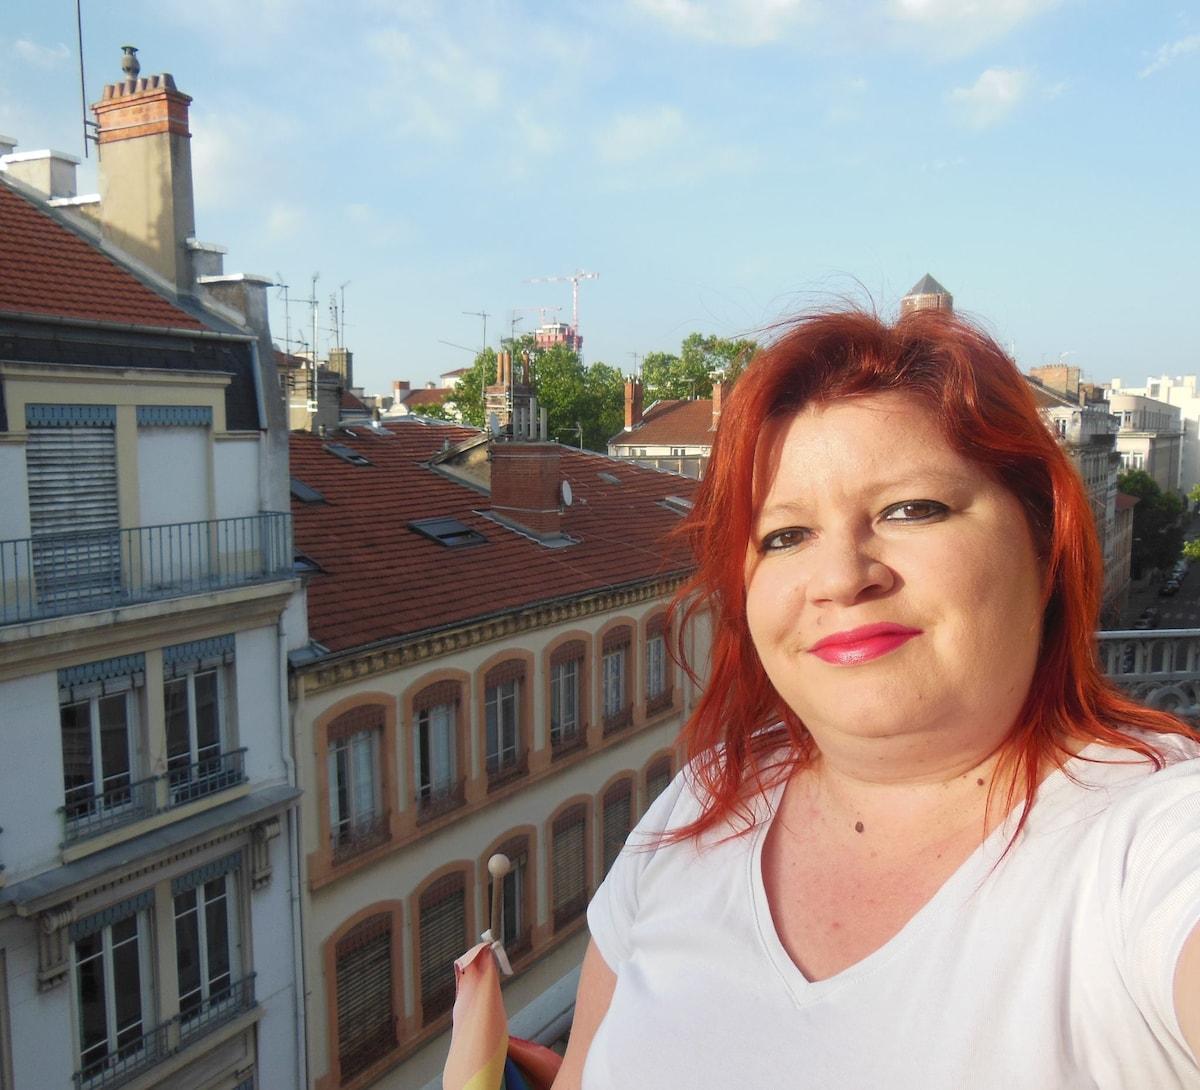 Amandine from Lyon